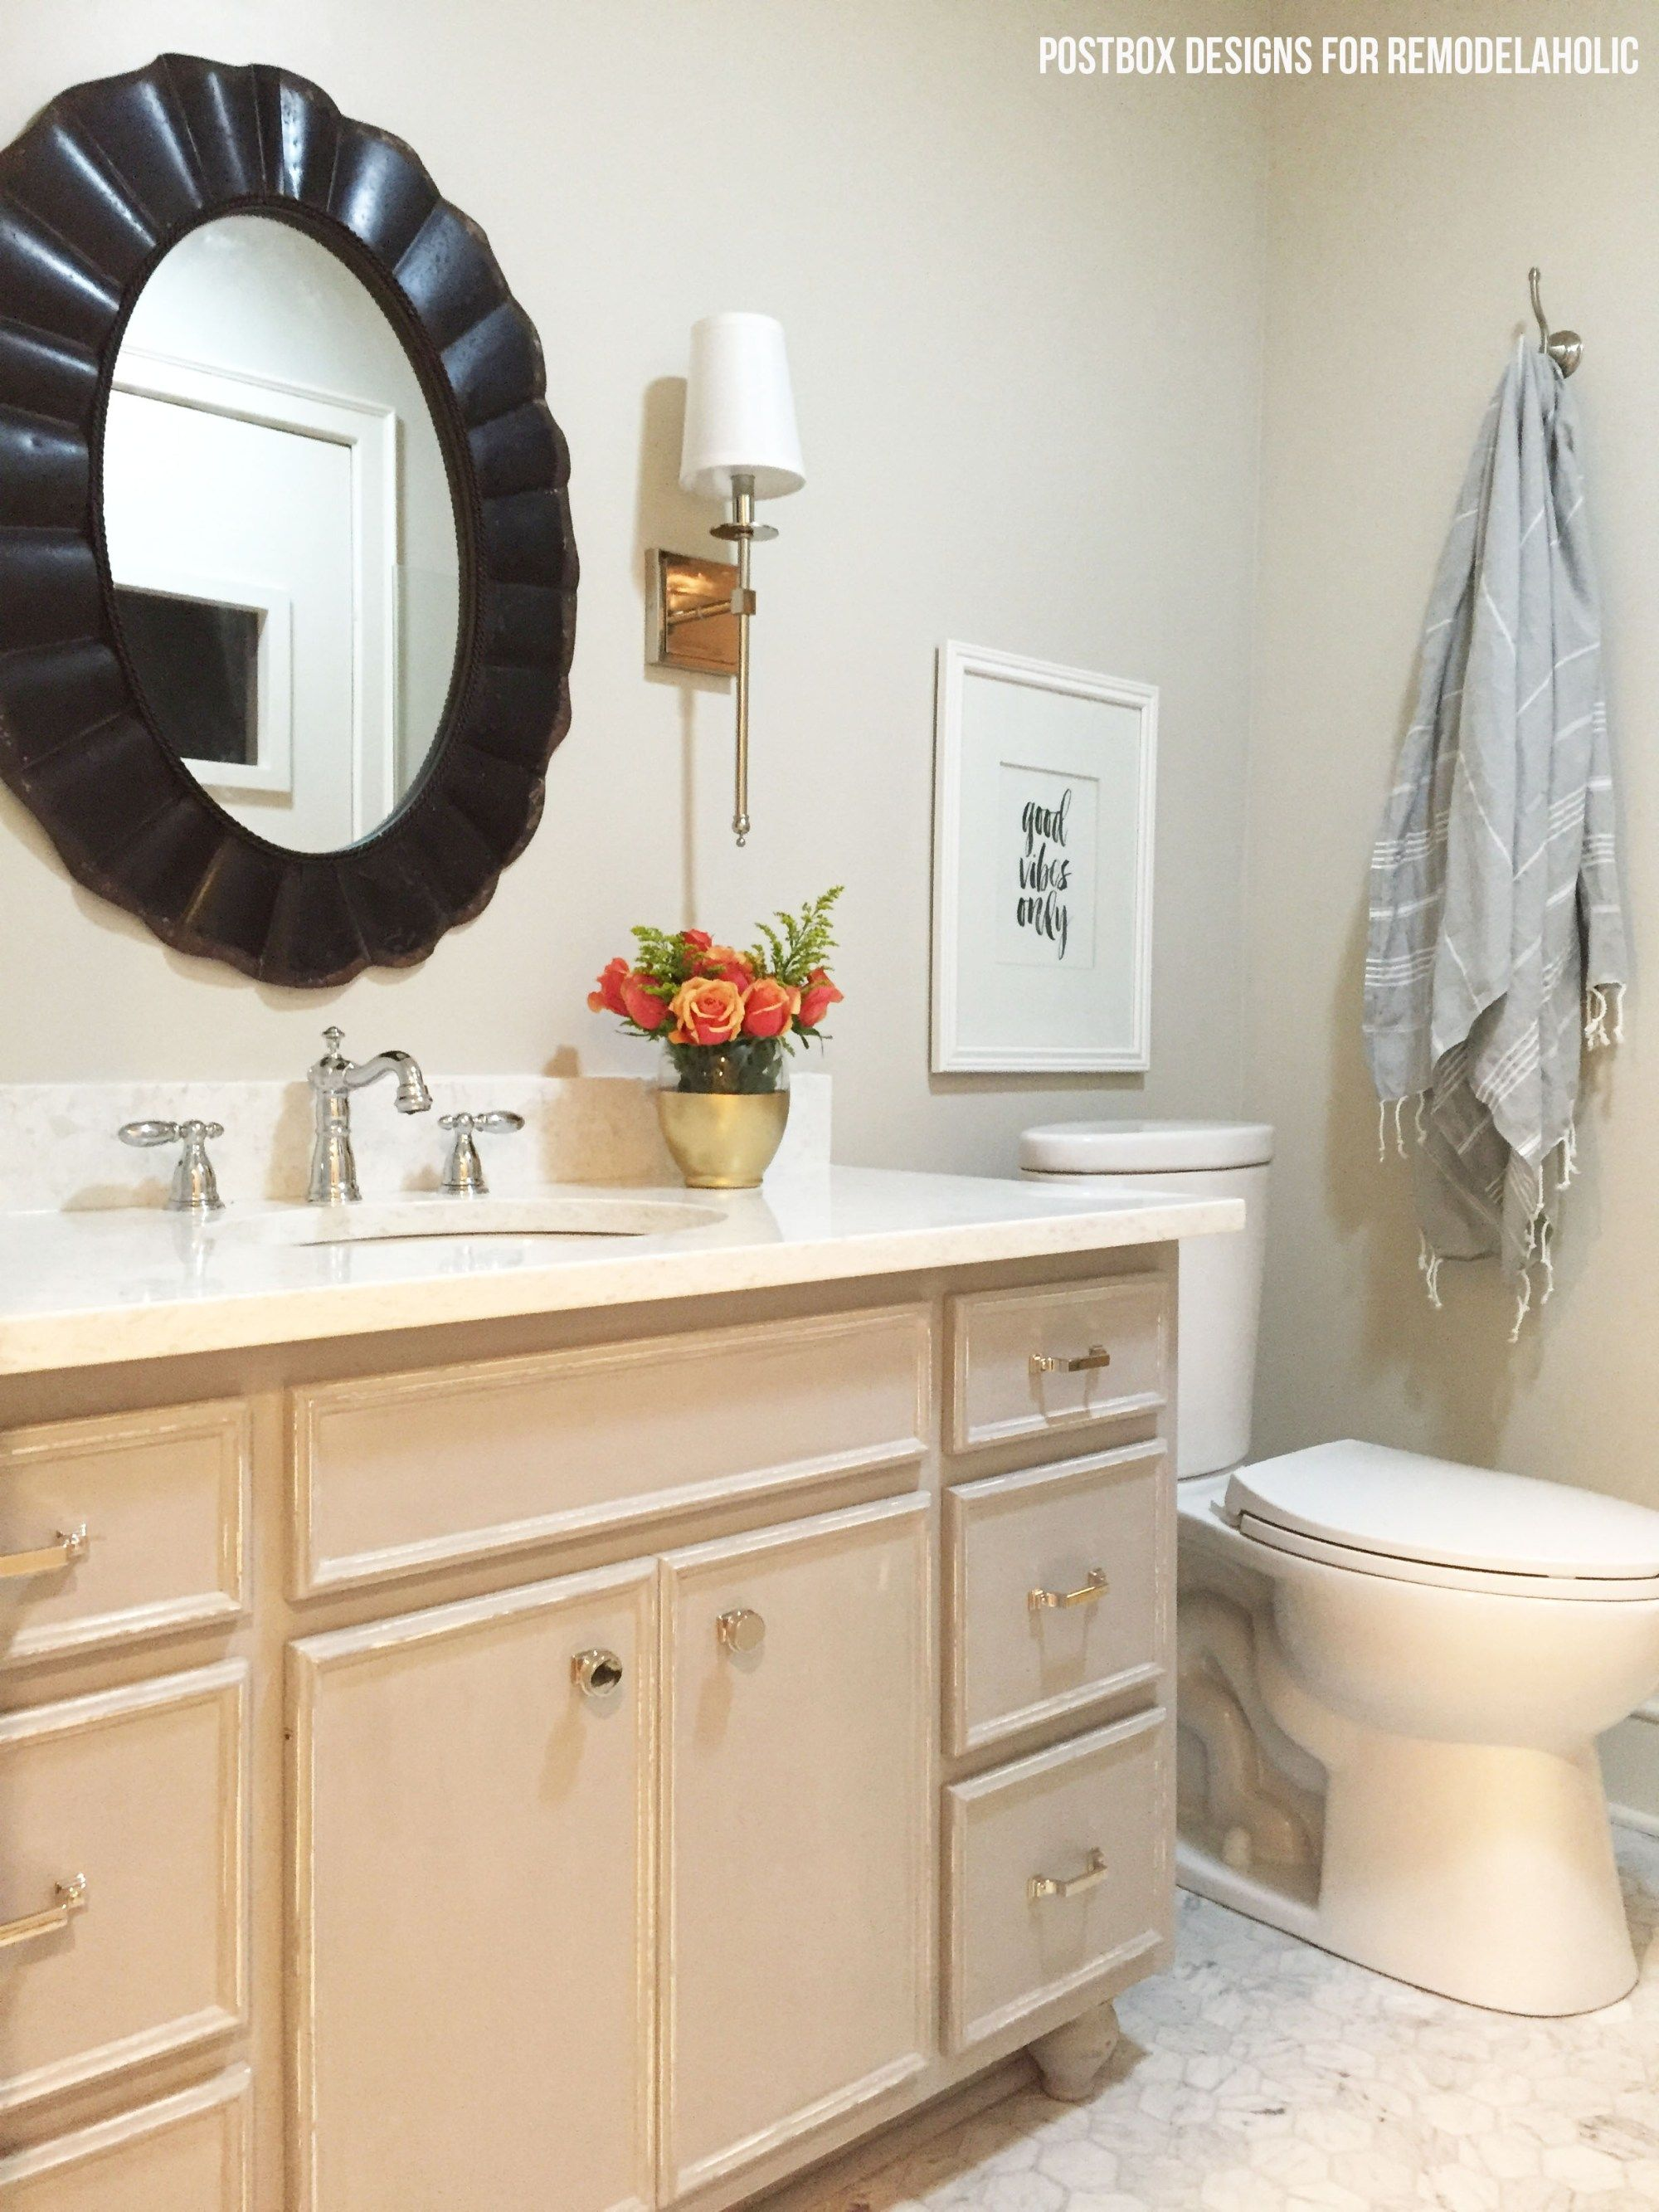 Chalk Paint bathroom vanity makeover and full bath renovation